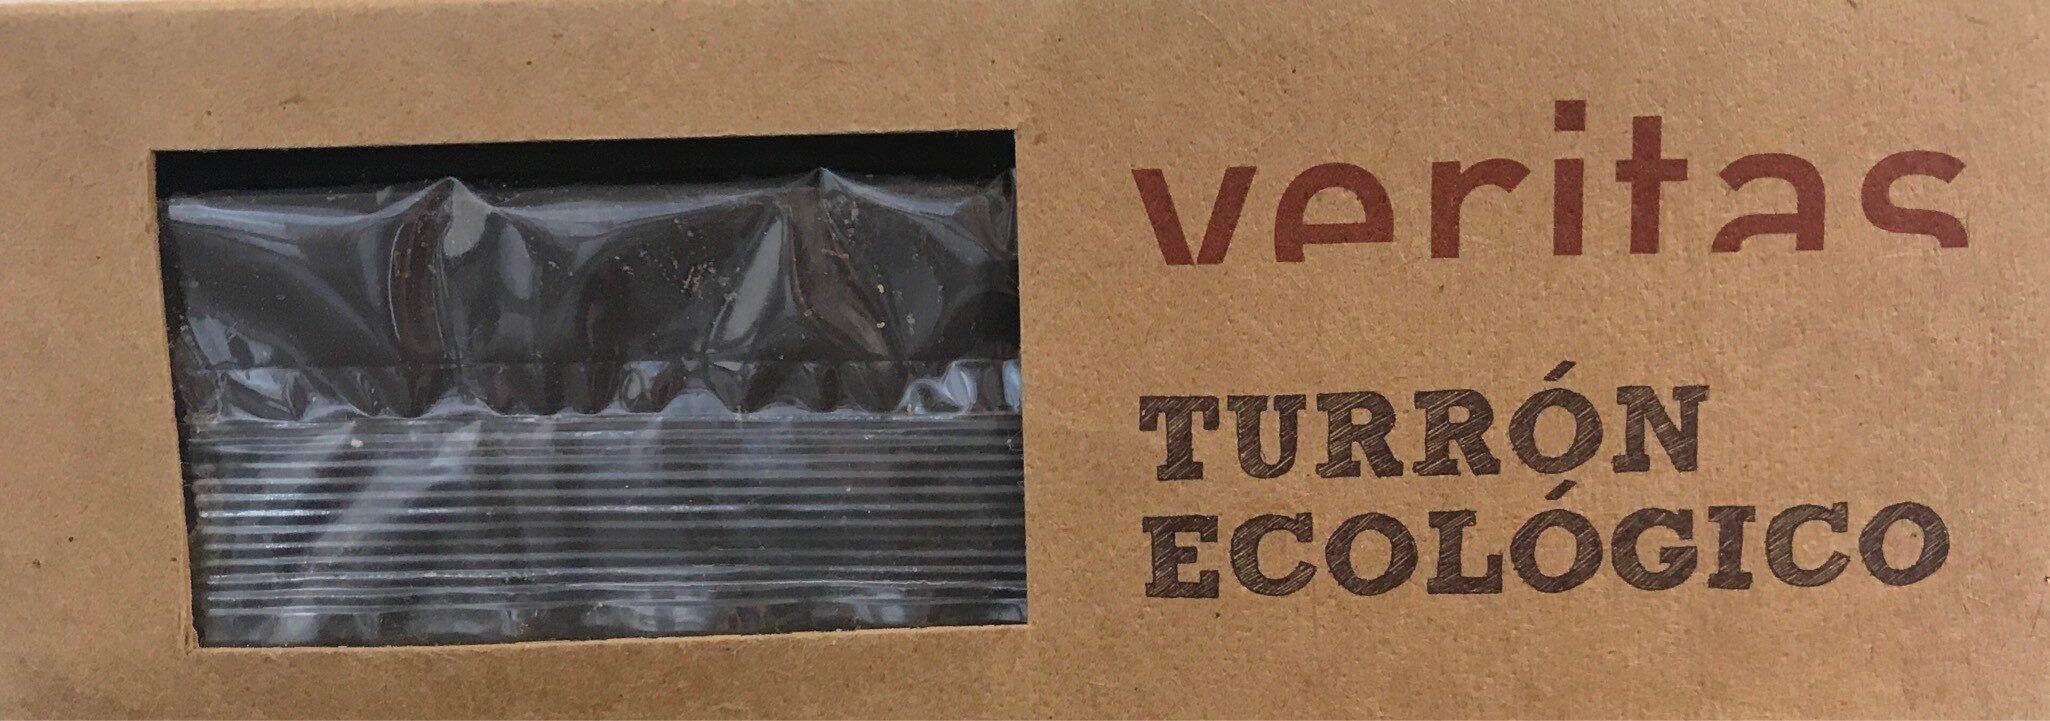 Turron ecologico - Producto